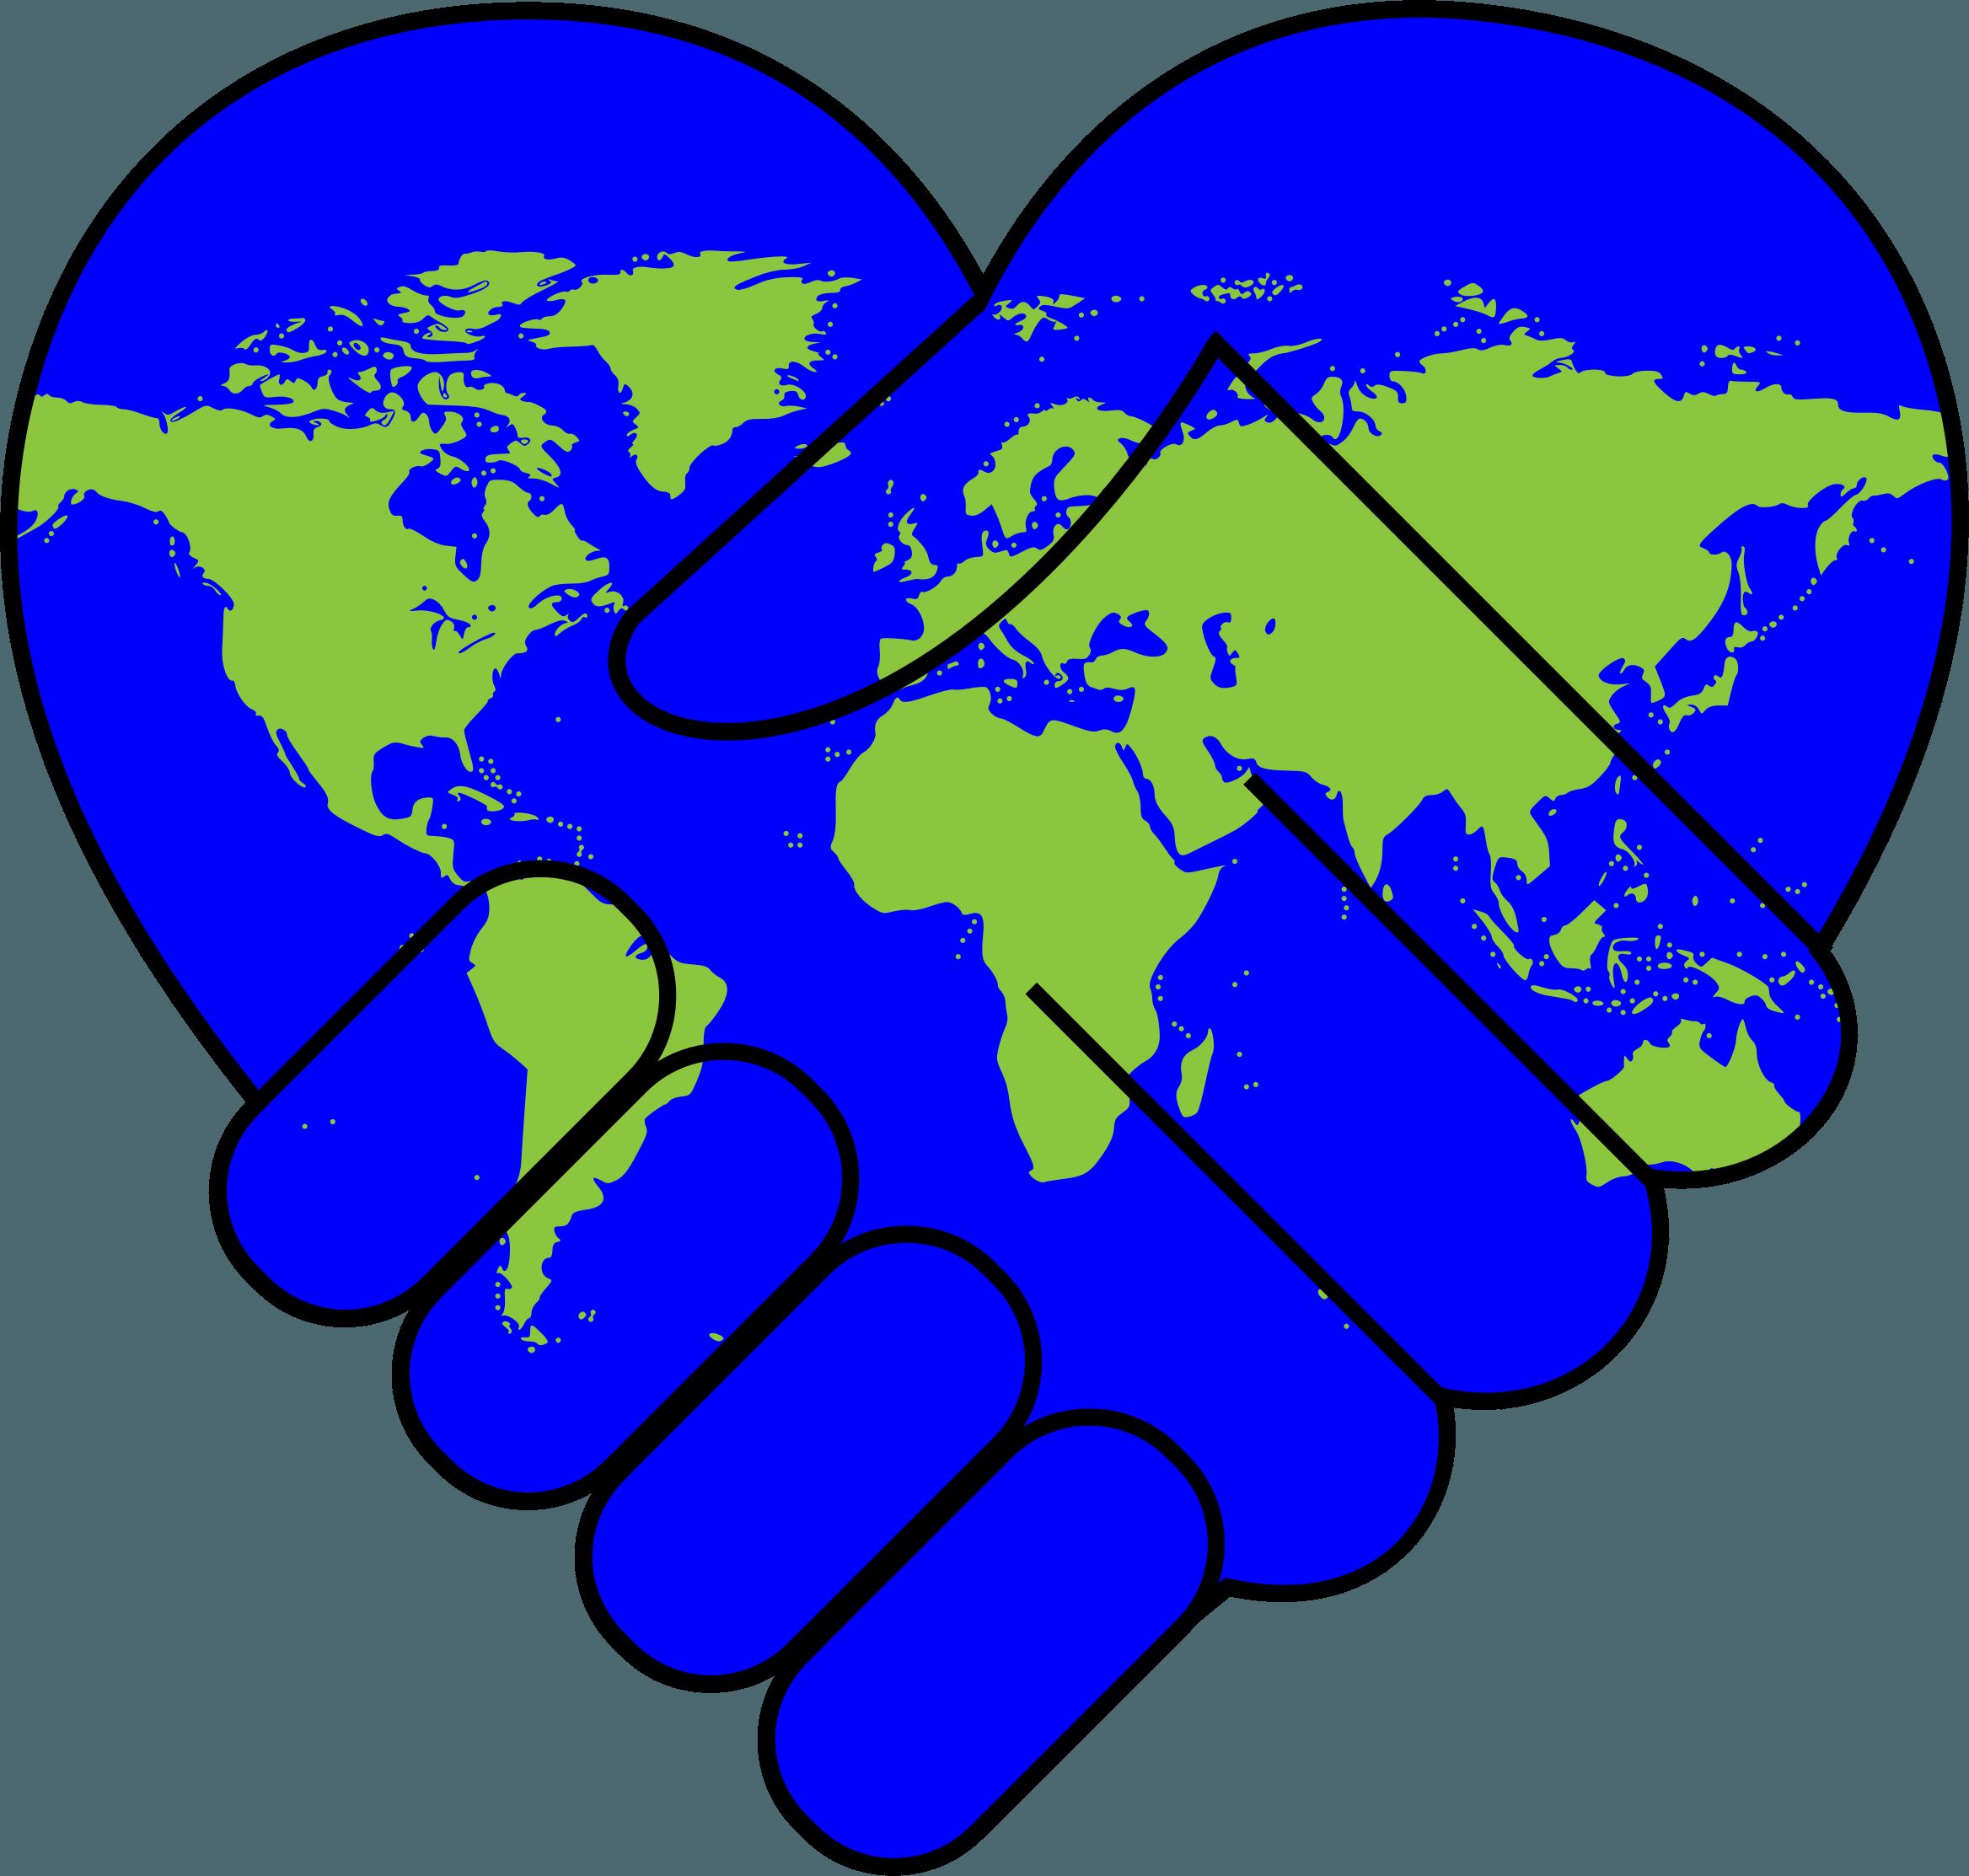 Neighbors clipart peaceful community. International day of peace